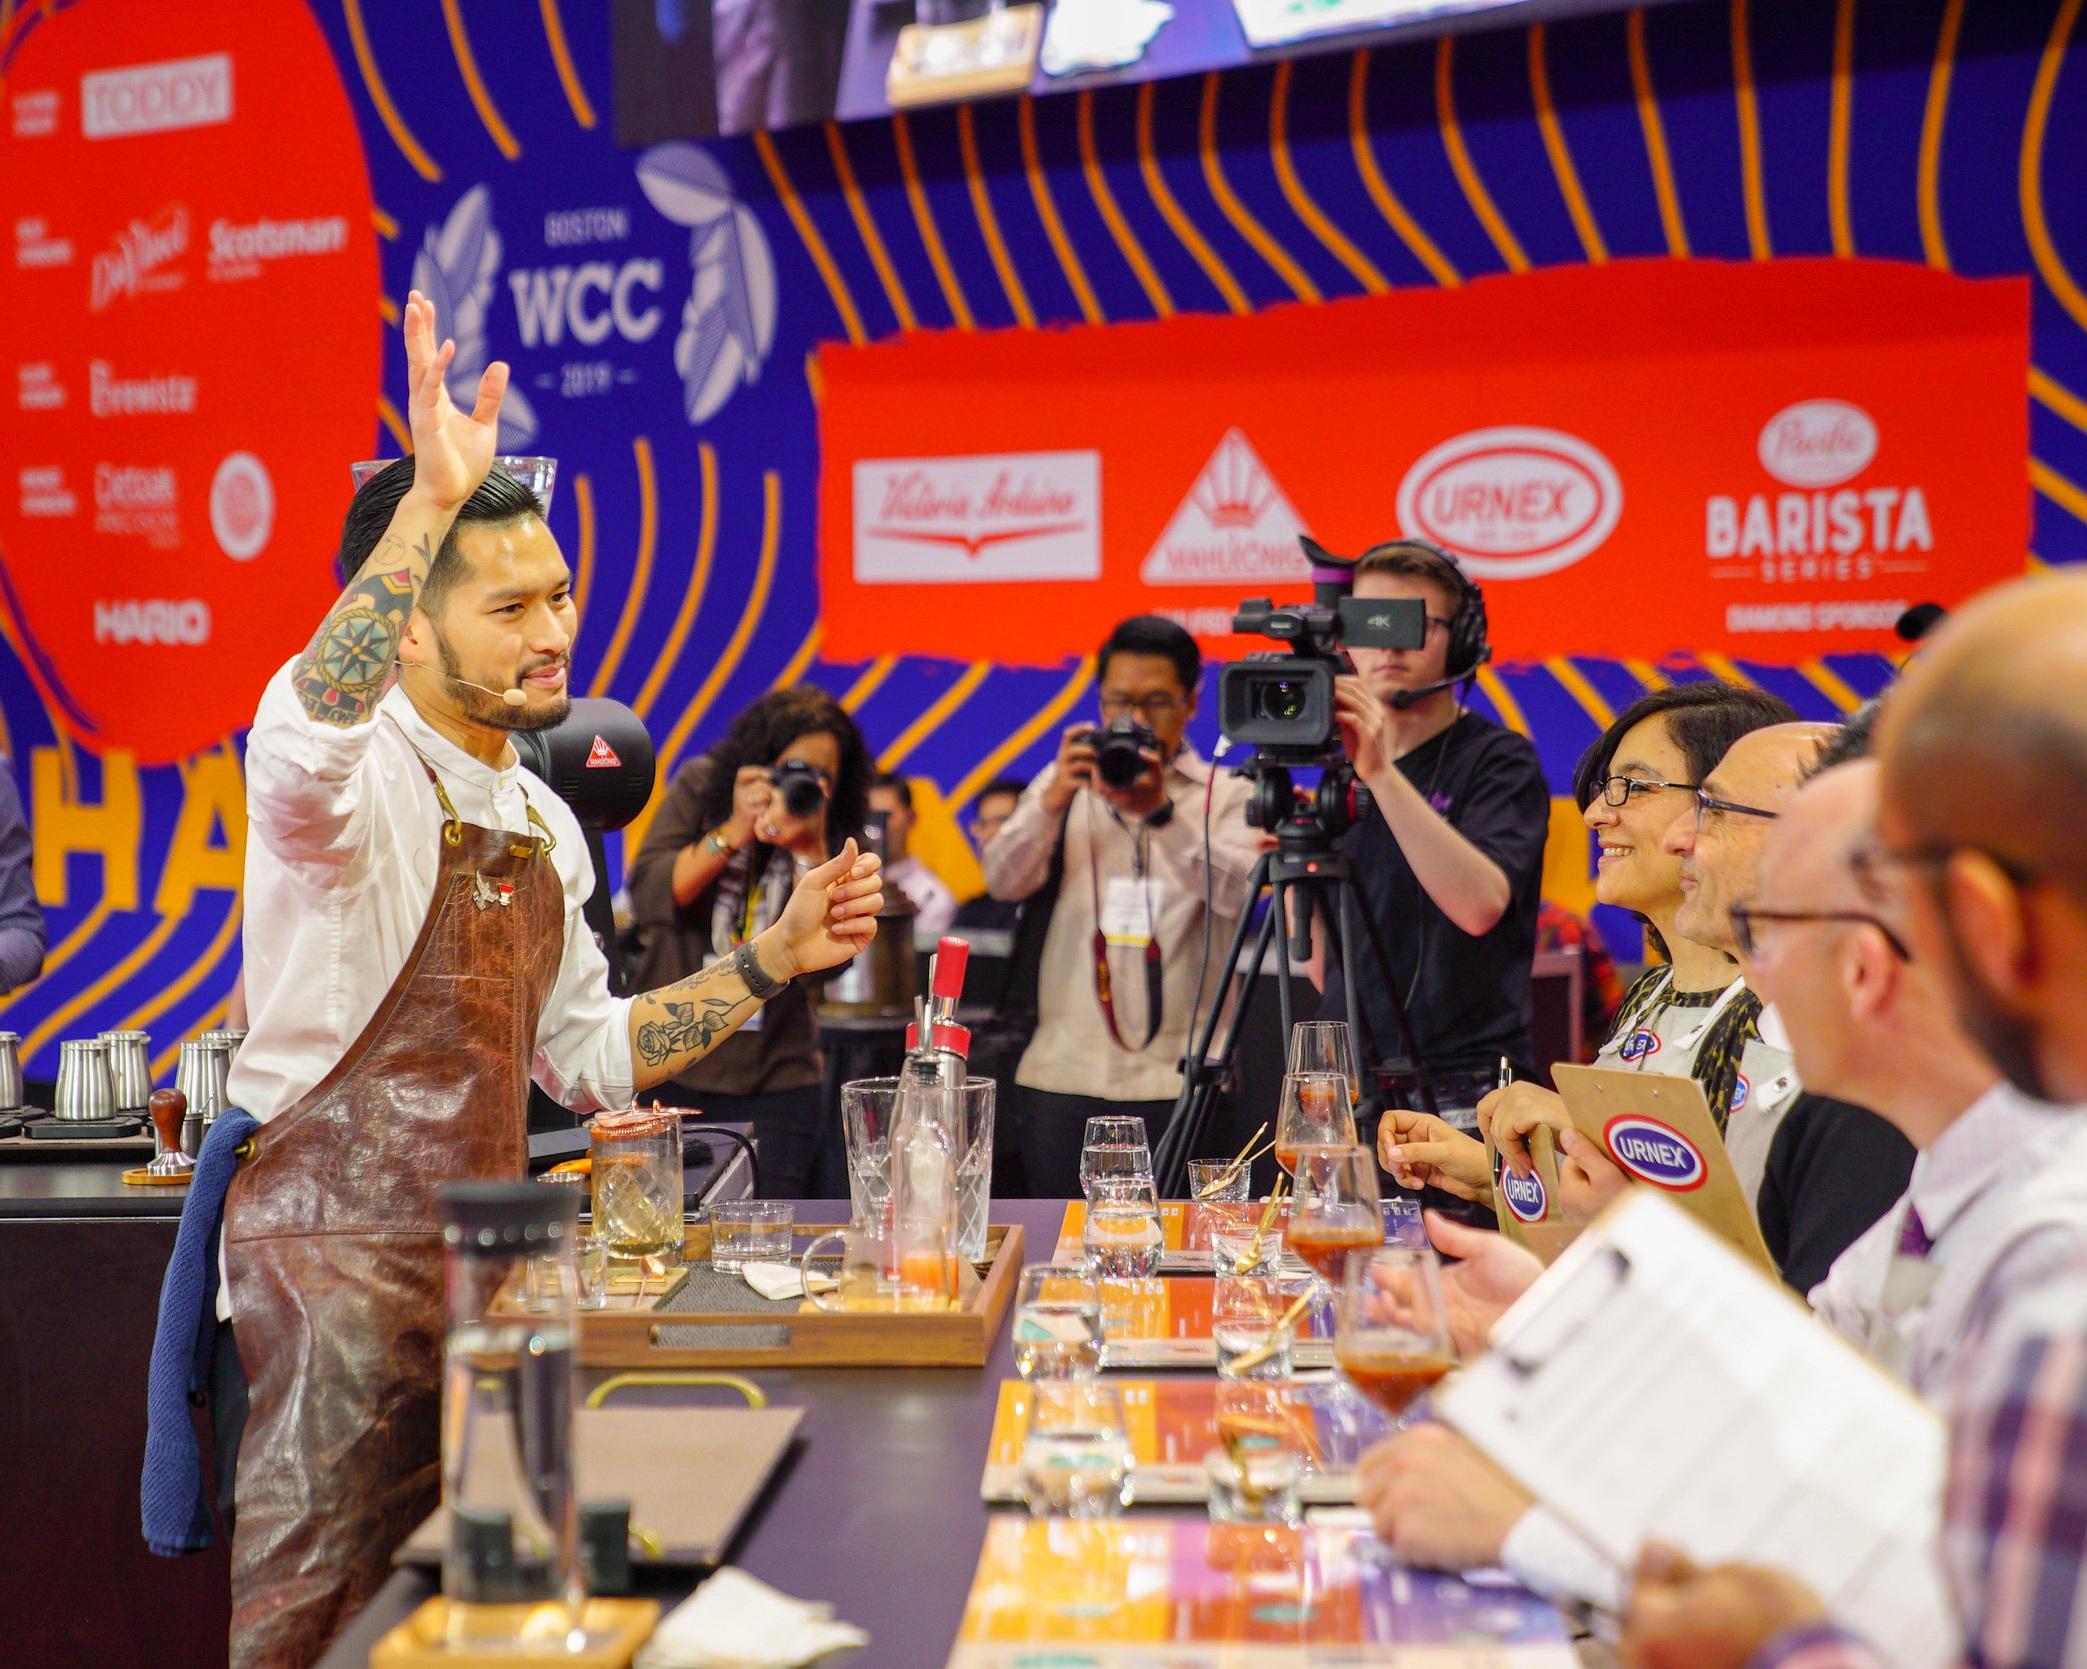 Mikael Jasin dari Common Grounds Coffee Roaster Jakarta meraih juara ke-4 World Barista Championship. Photo:  World Coffee Events